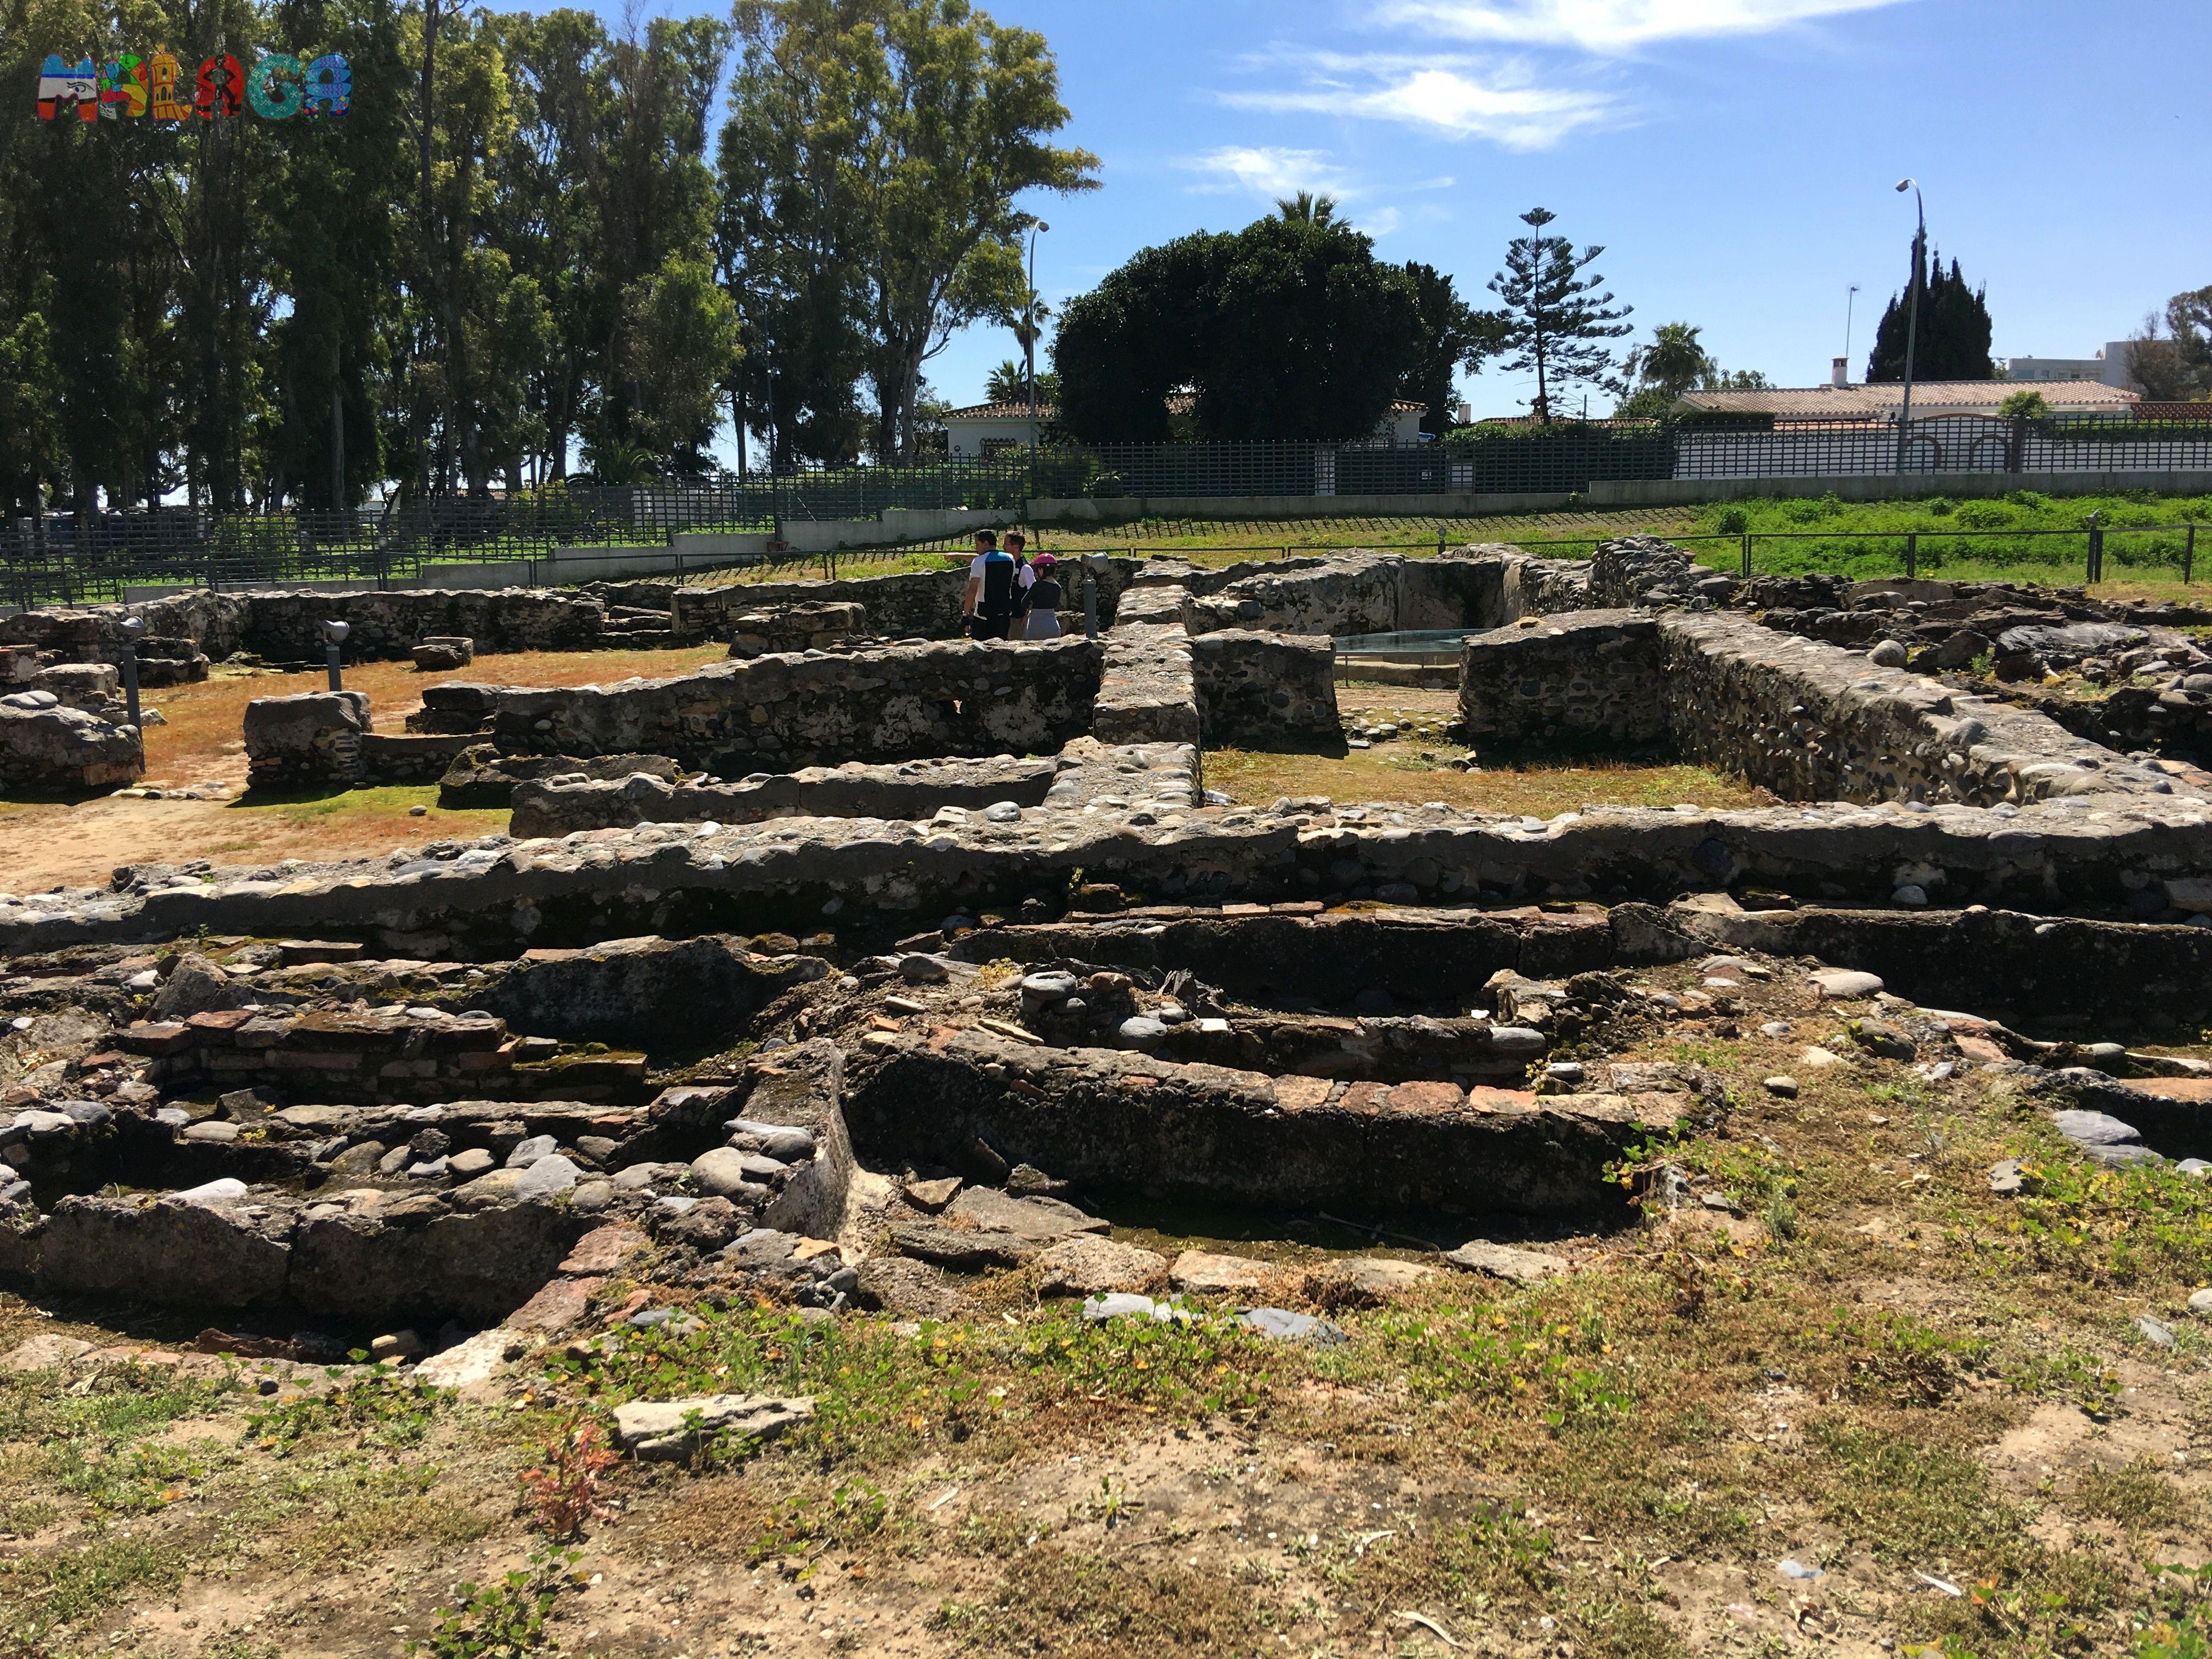 Basilica-paleocristiana-vega-del-mar1